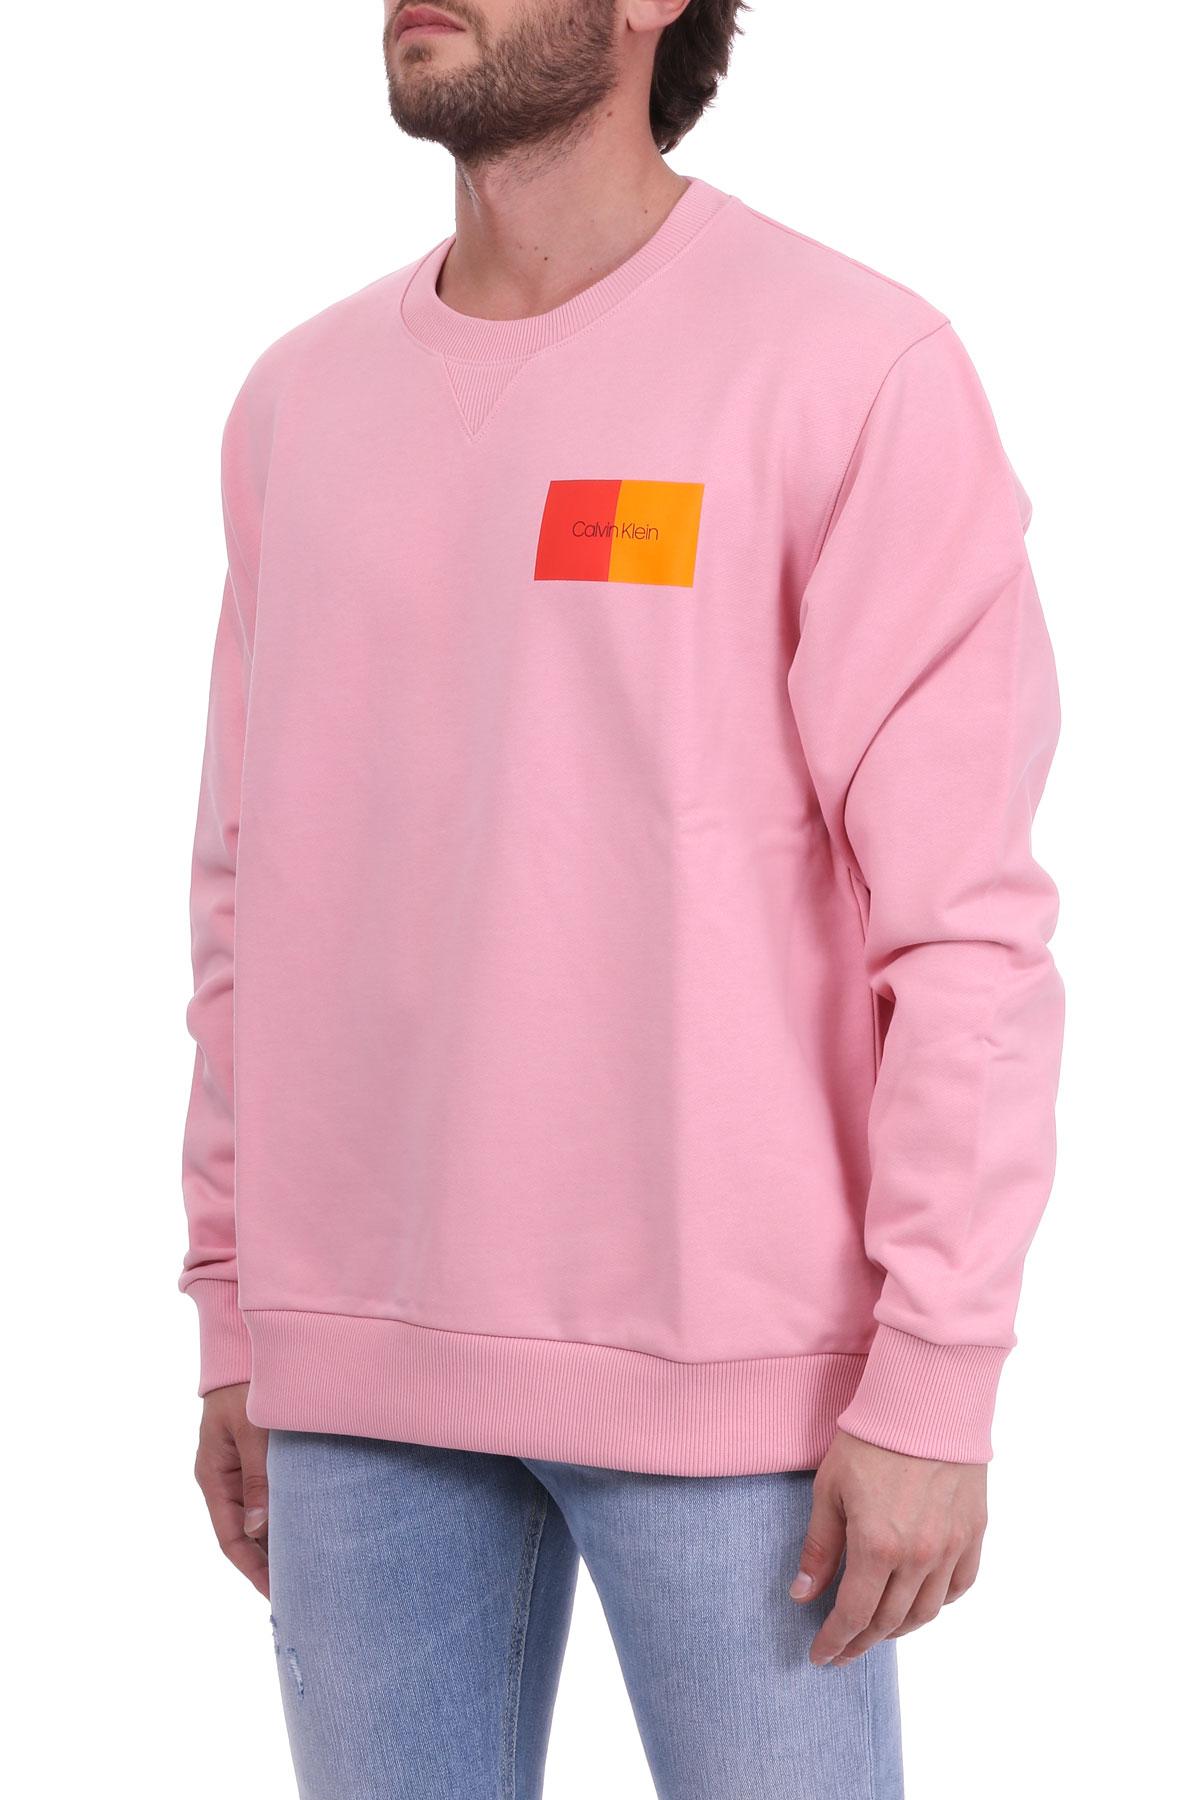 PINK COTTON SWEATSHIRT WITH BICOLOR LOGO CALVIN KLEIN | Sweatshirts | K10K102974665ROSA